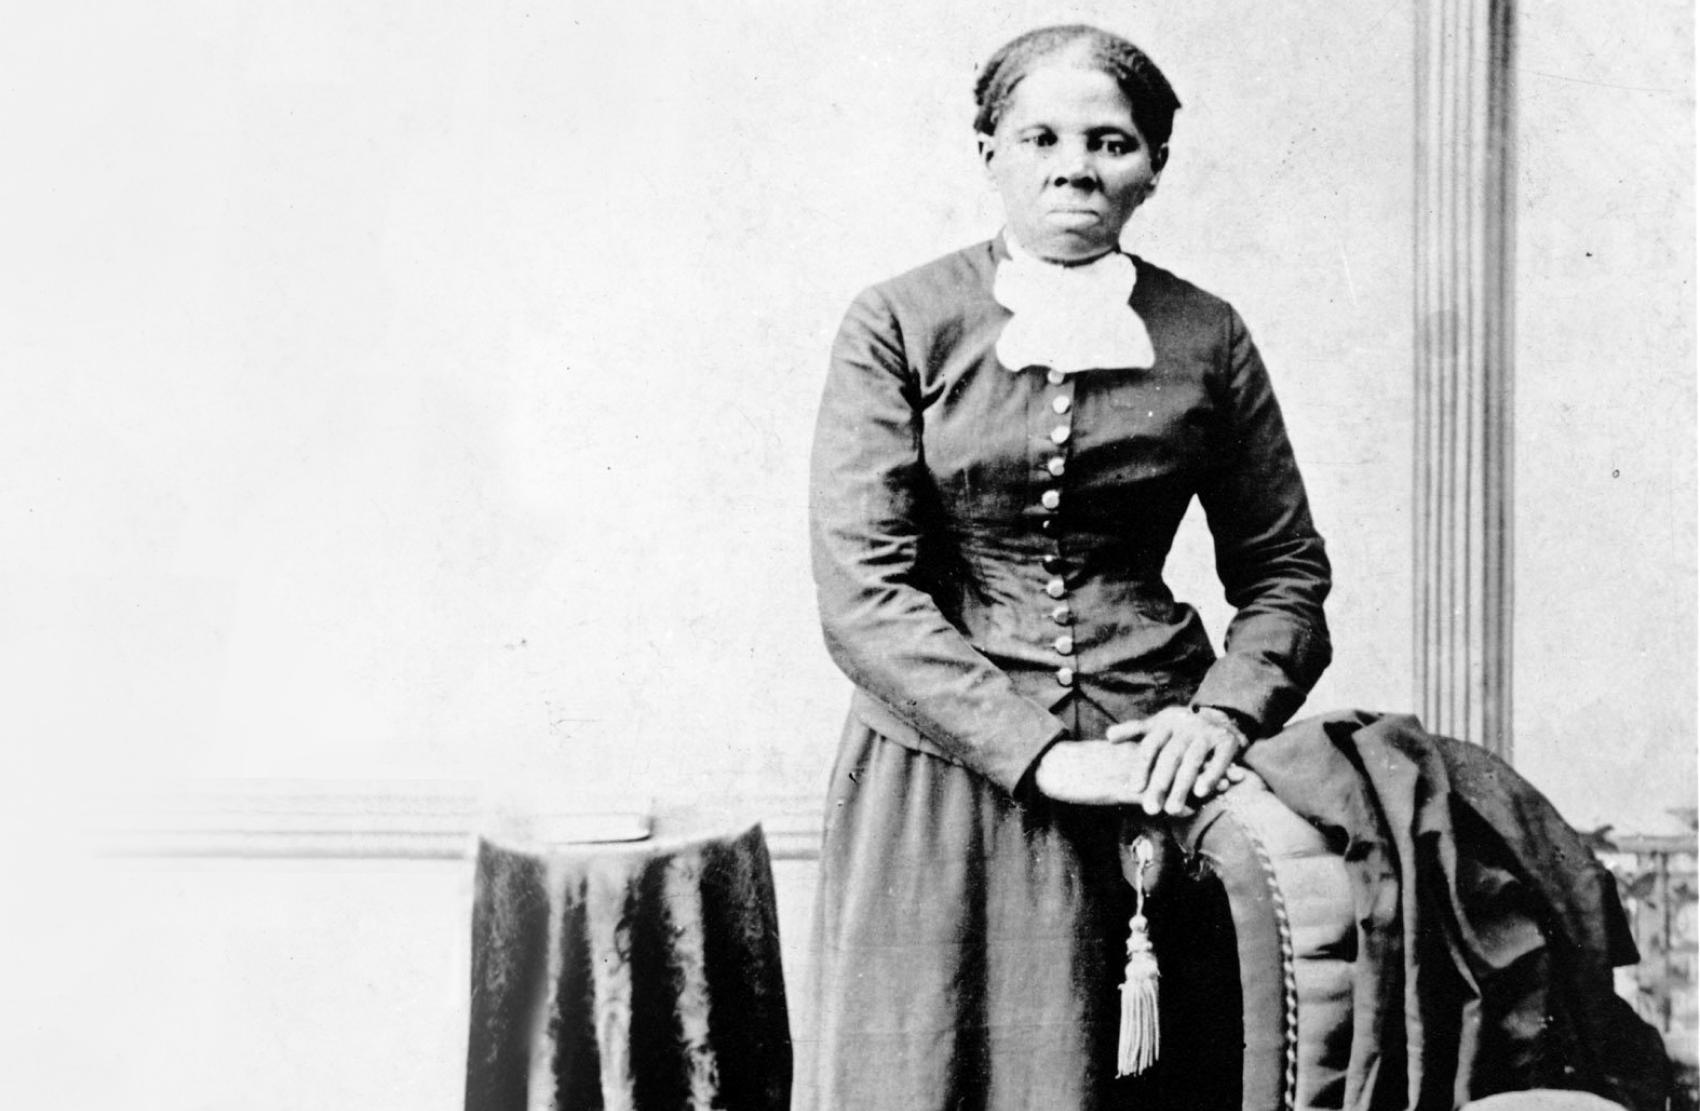 Portrait photo of Harriet Tubman who had seizures